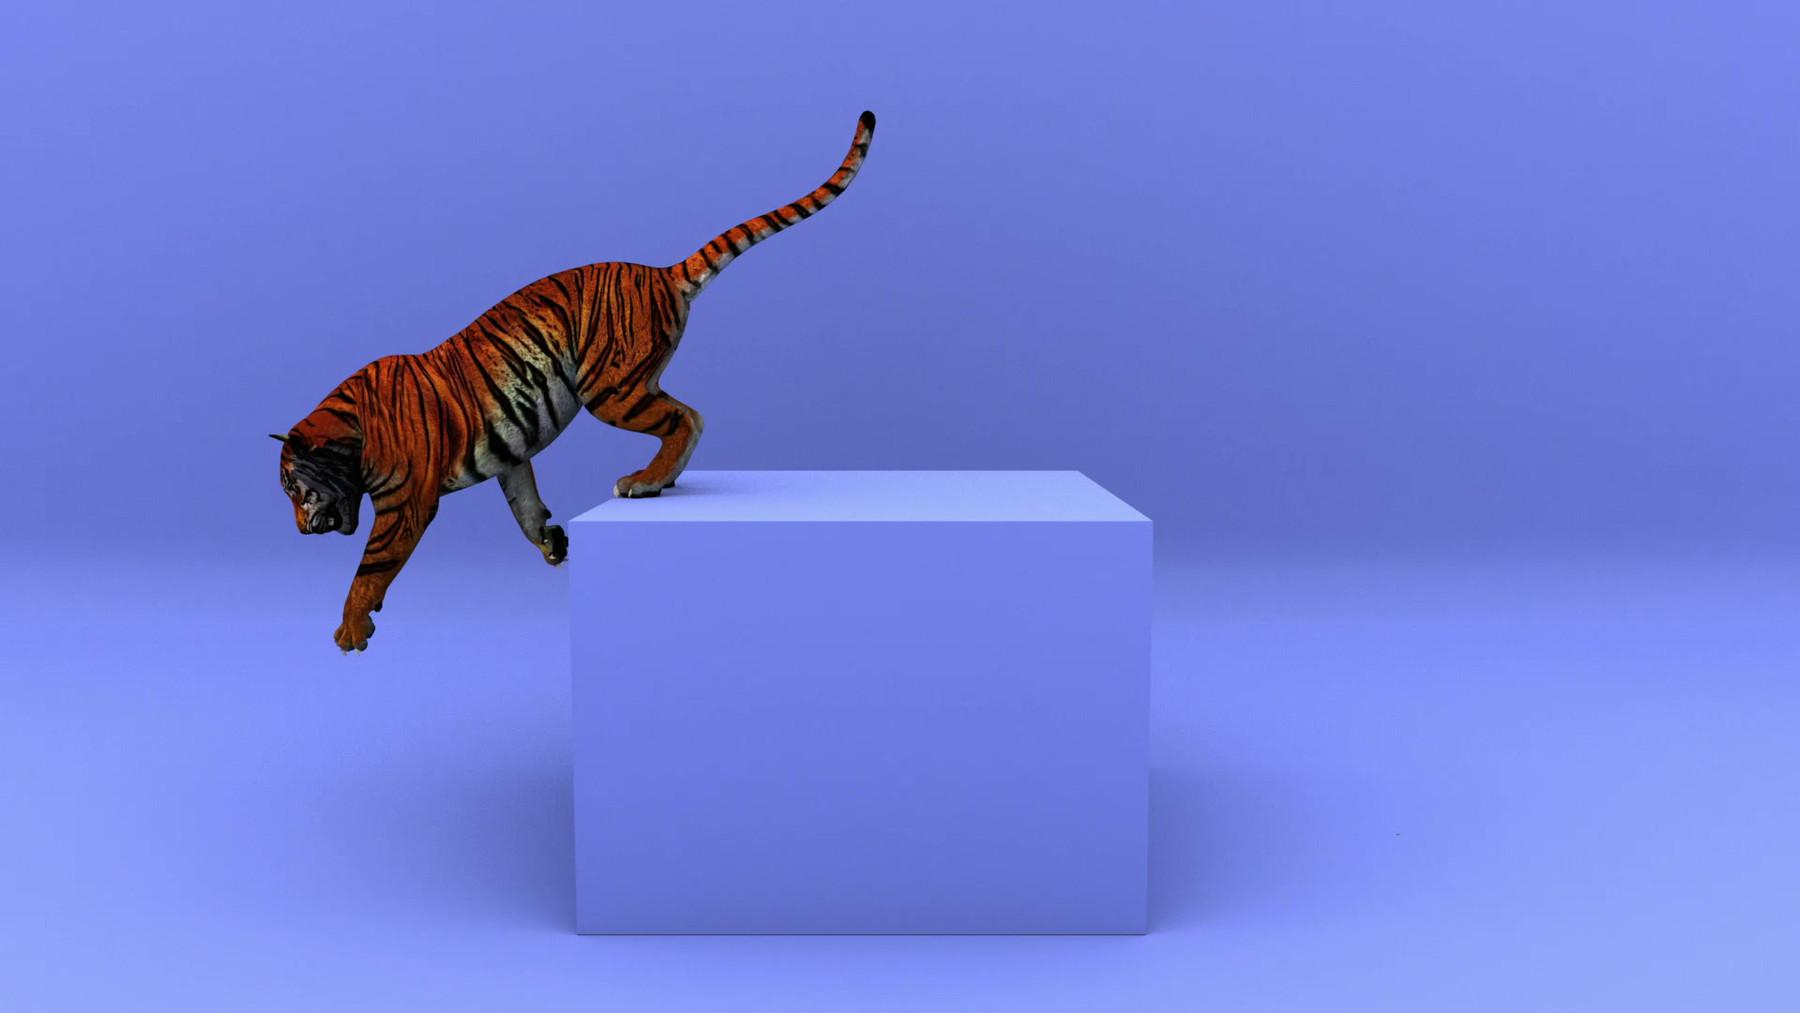 tiger_jump_up_down.mp4